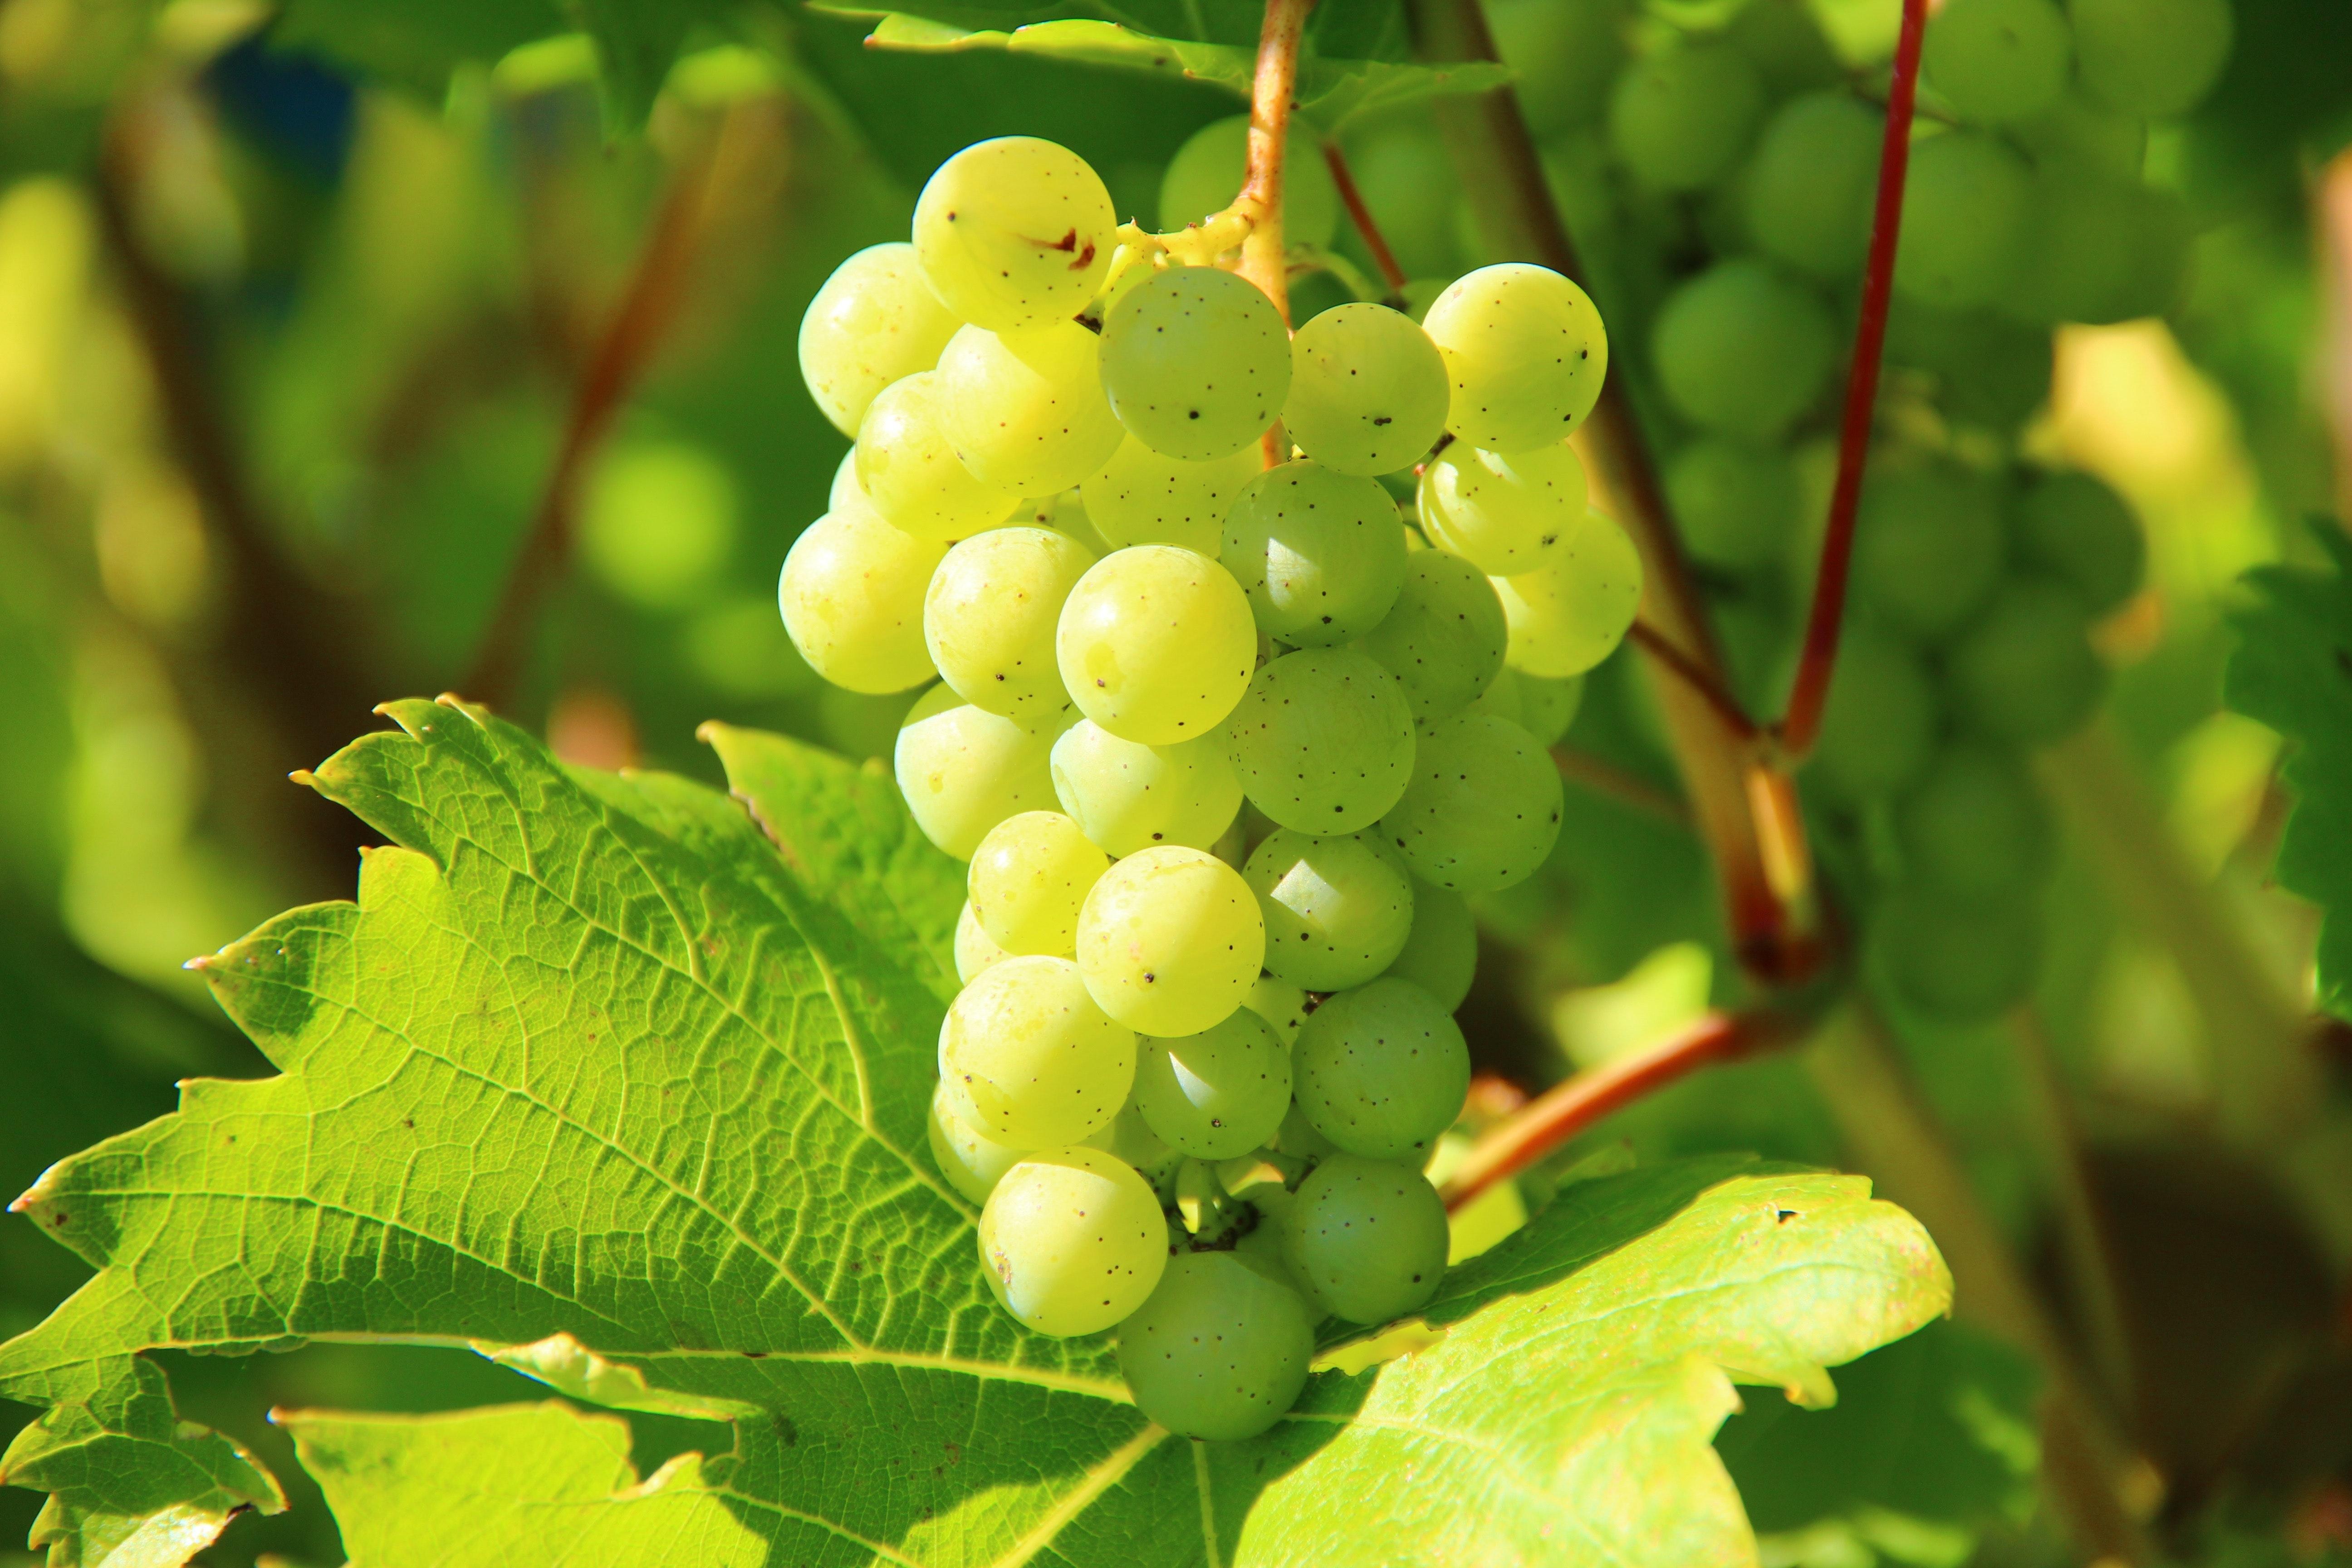 Green Grapes, Food, Fruit, Grapes, Green, HQ Photo